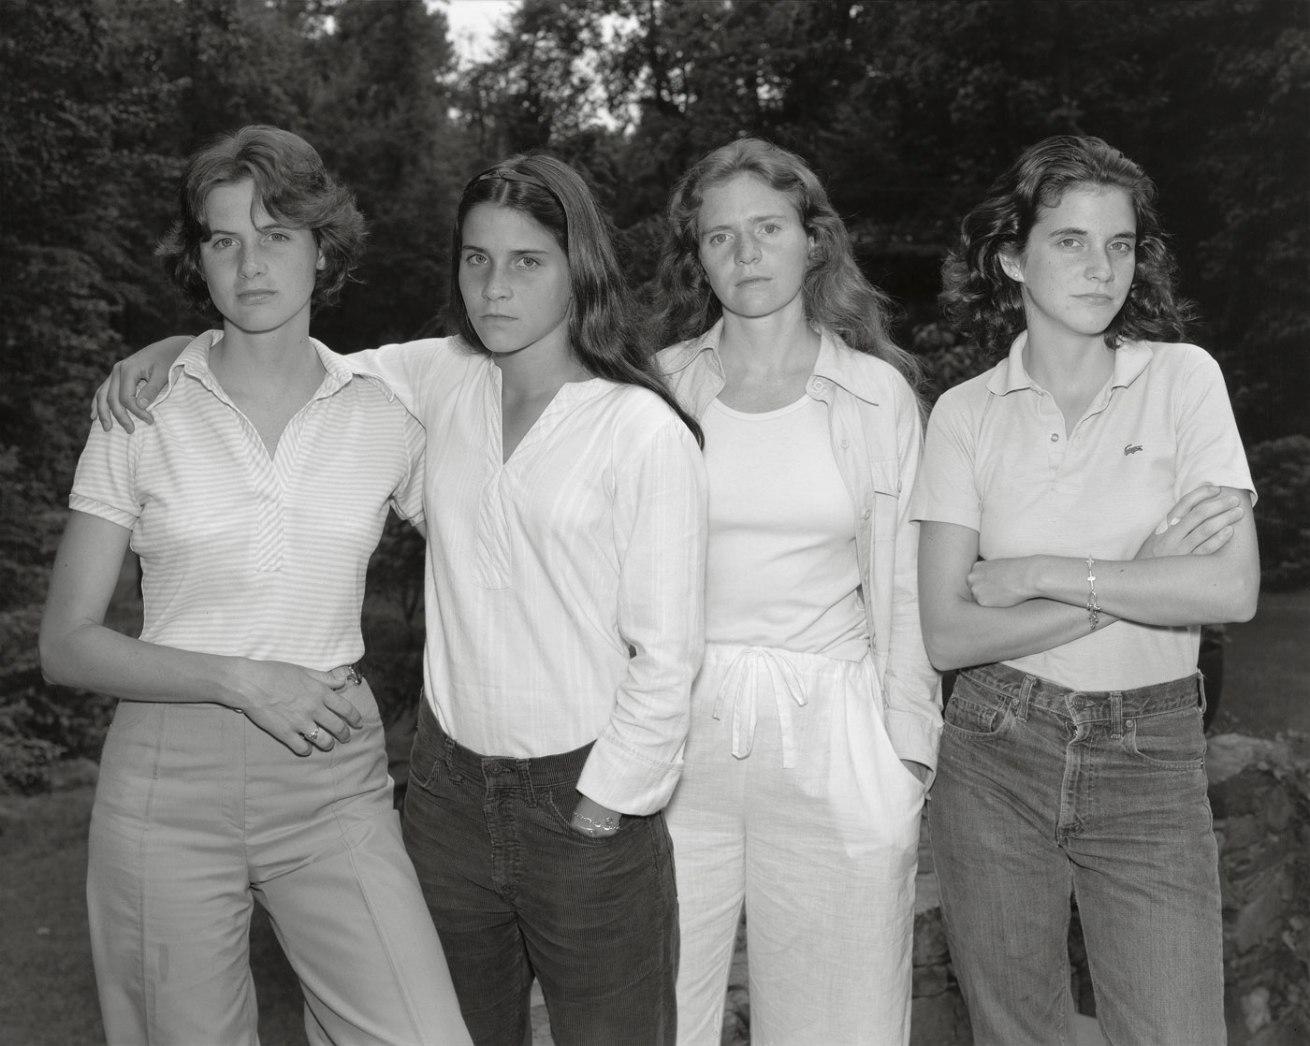 Fotó: The Brown Sisters, New Canaan, Connecticut, 1975 © Nicholas Nixon